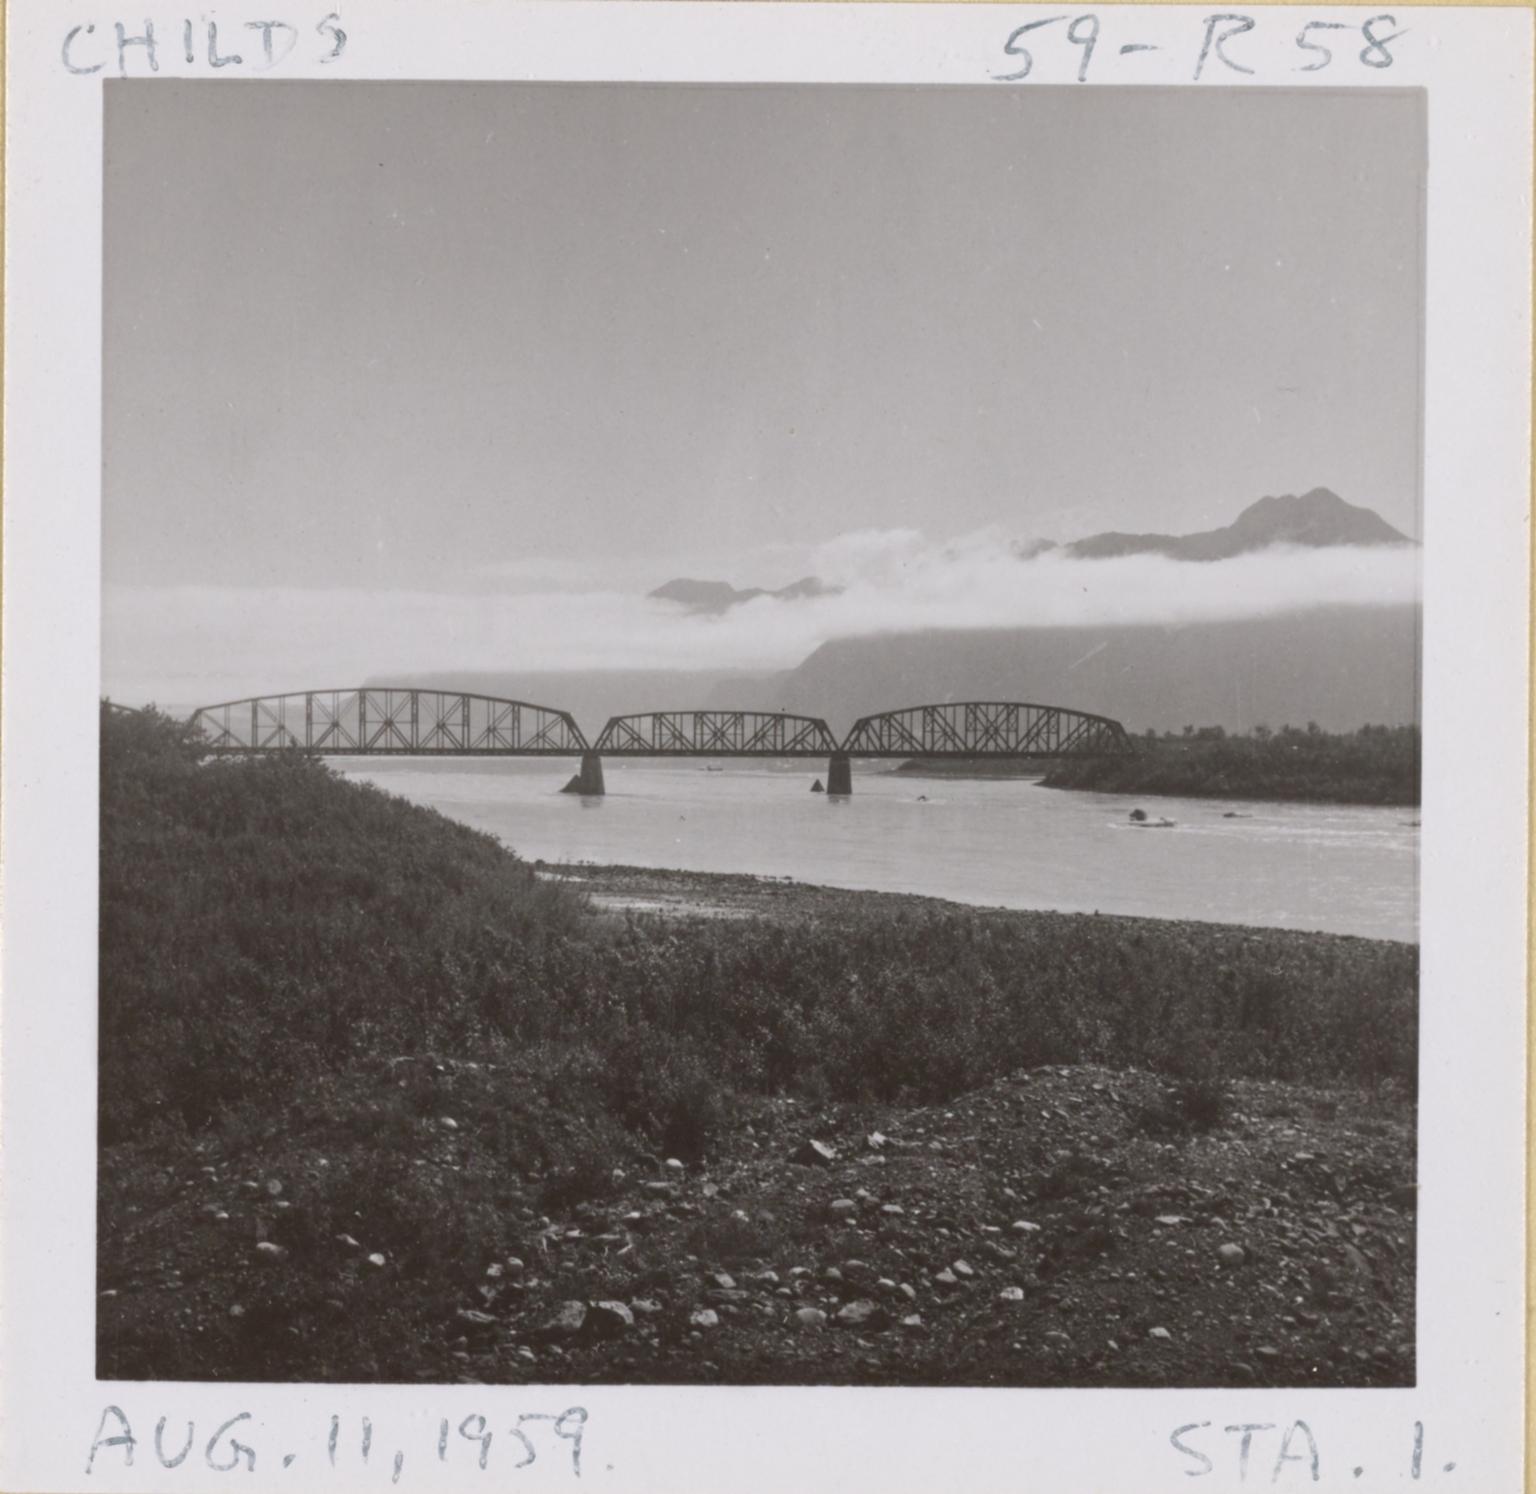 Childs Glacier, Alaska